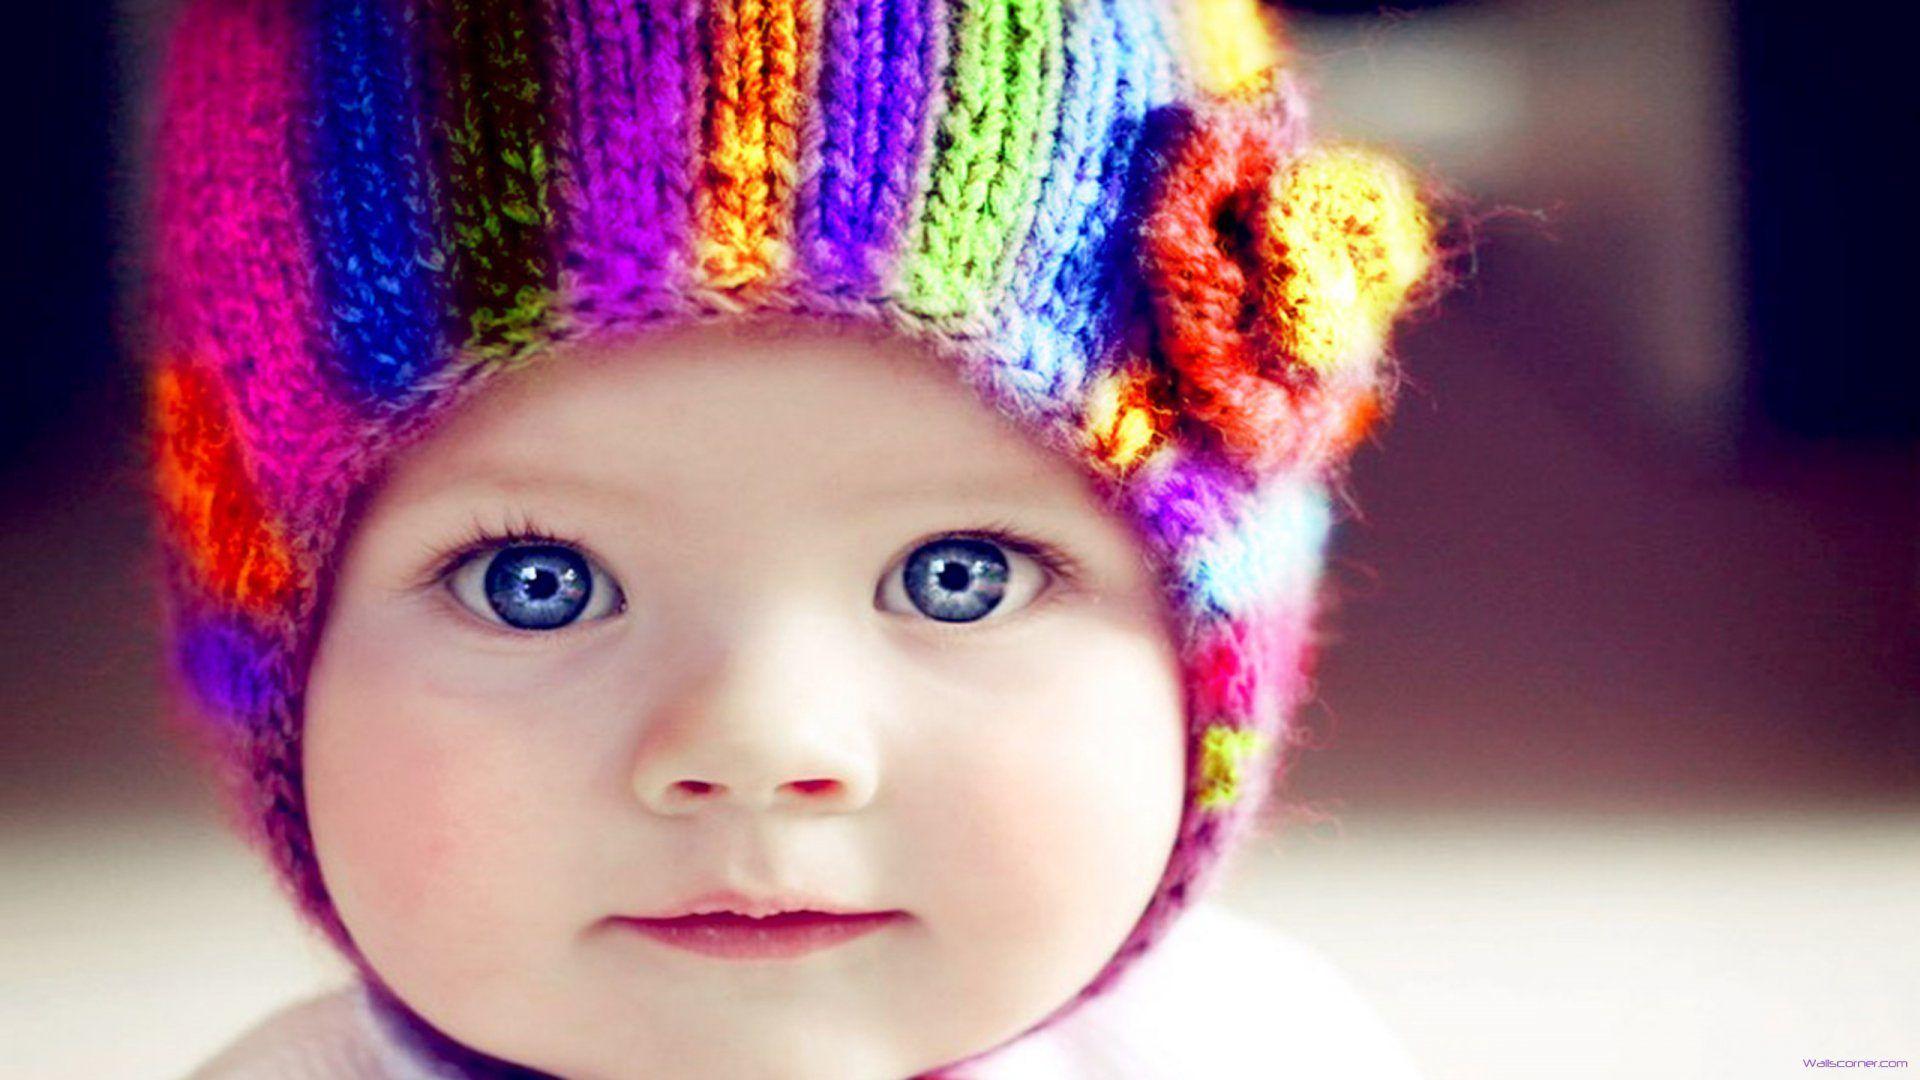 PERFECT WOMEN PHOTOS / AVATARS | Cute Perfect Baby Blue Eyes ...